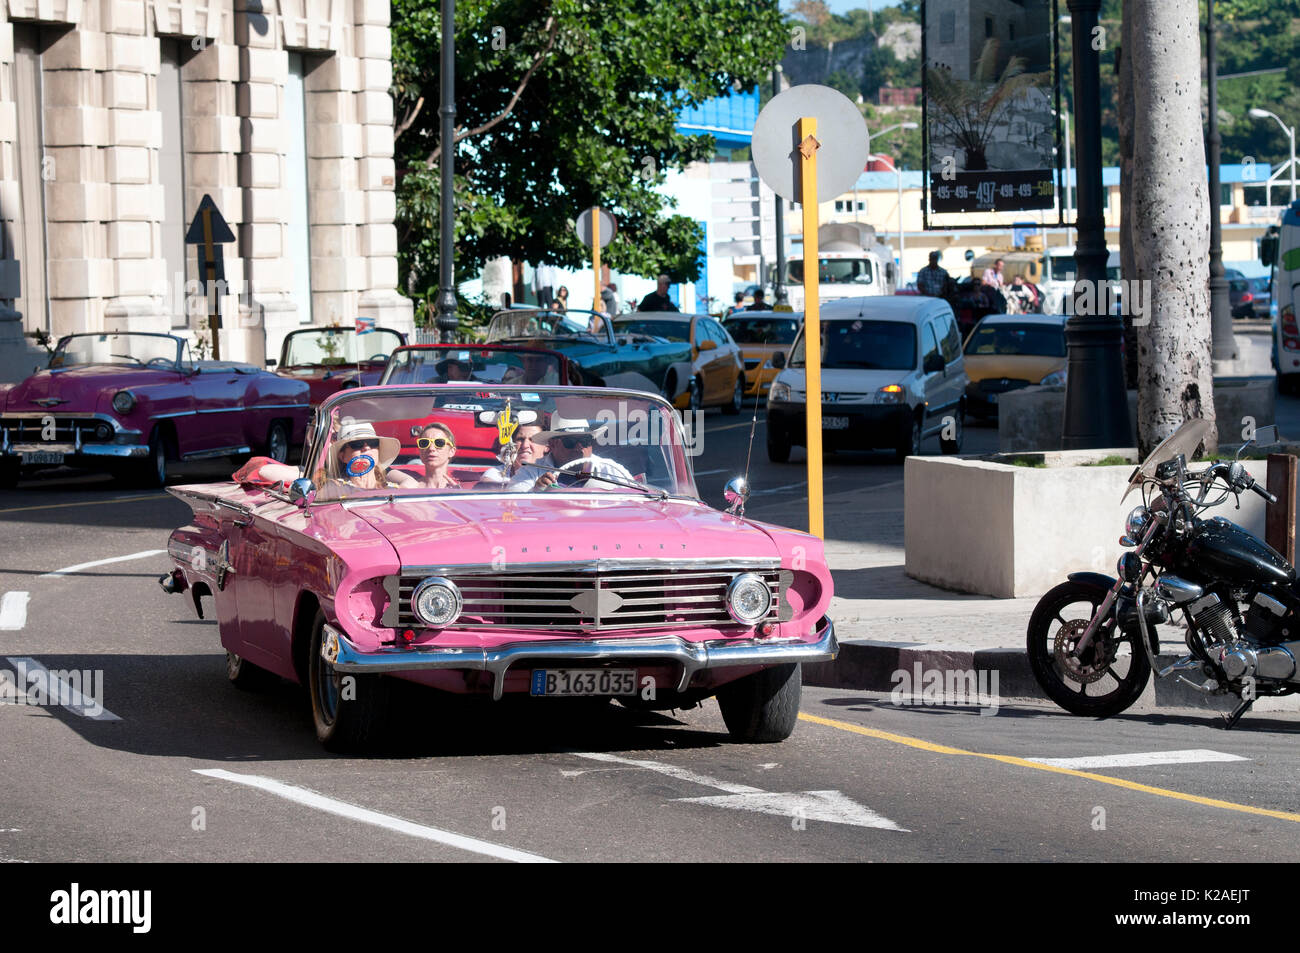 1960 Chevrolet convertible taxi in Havana Cuba - Stock Image